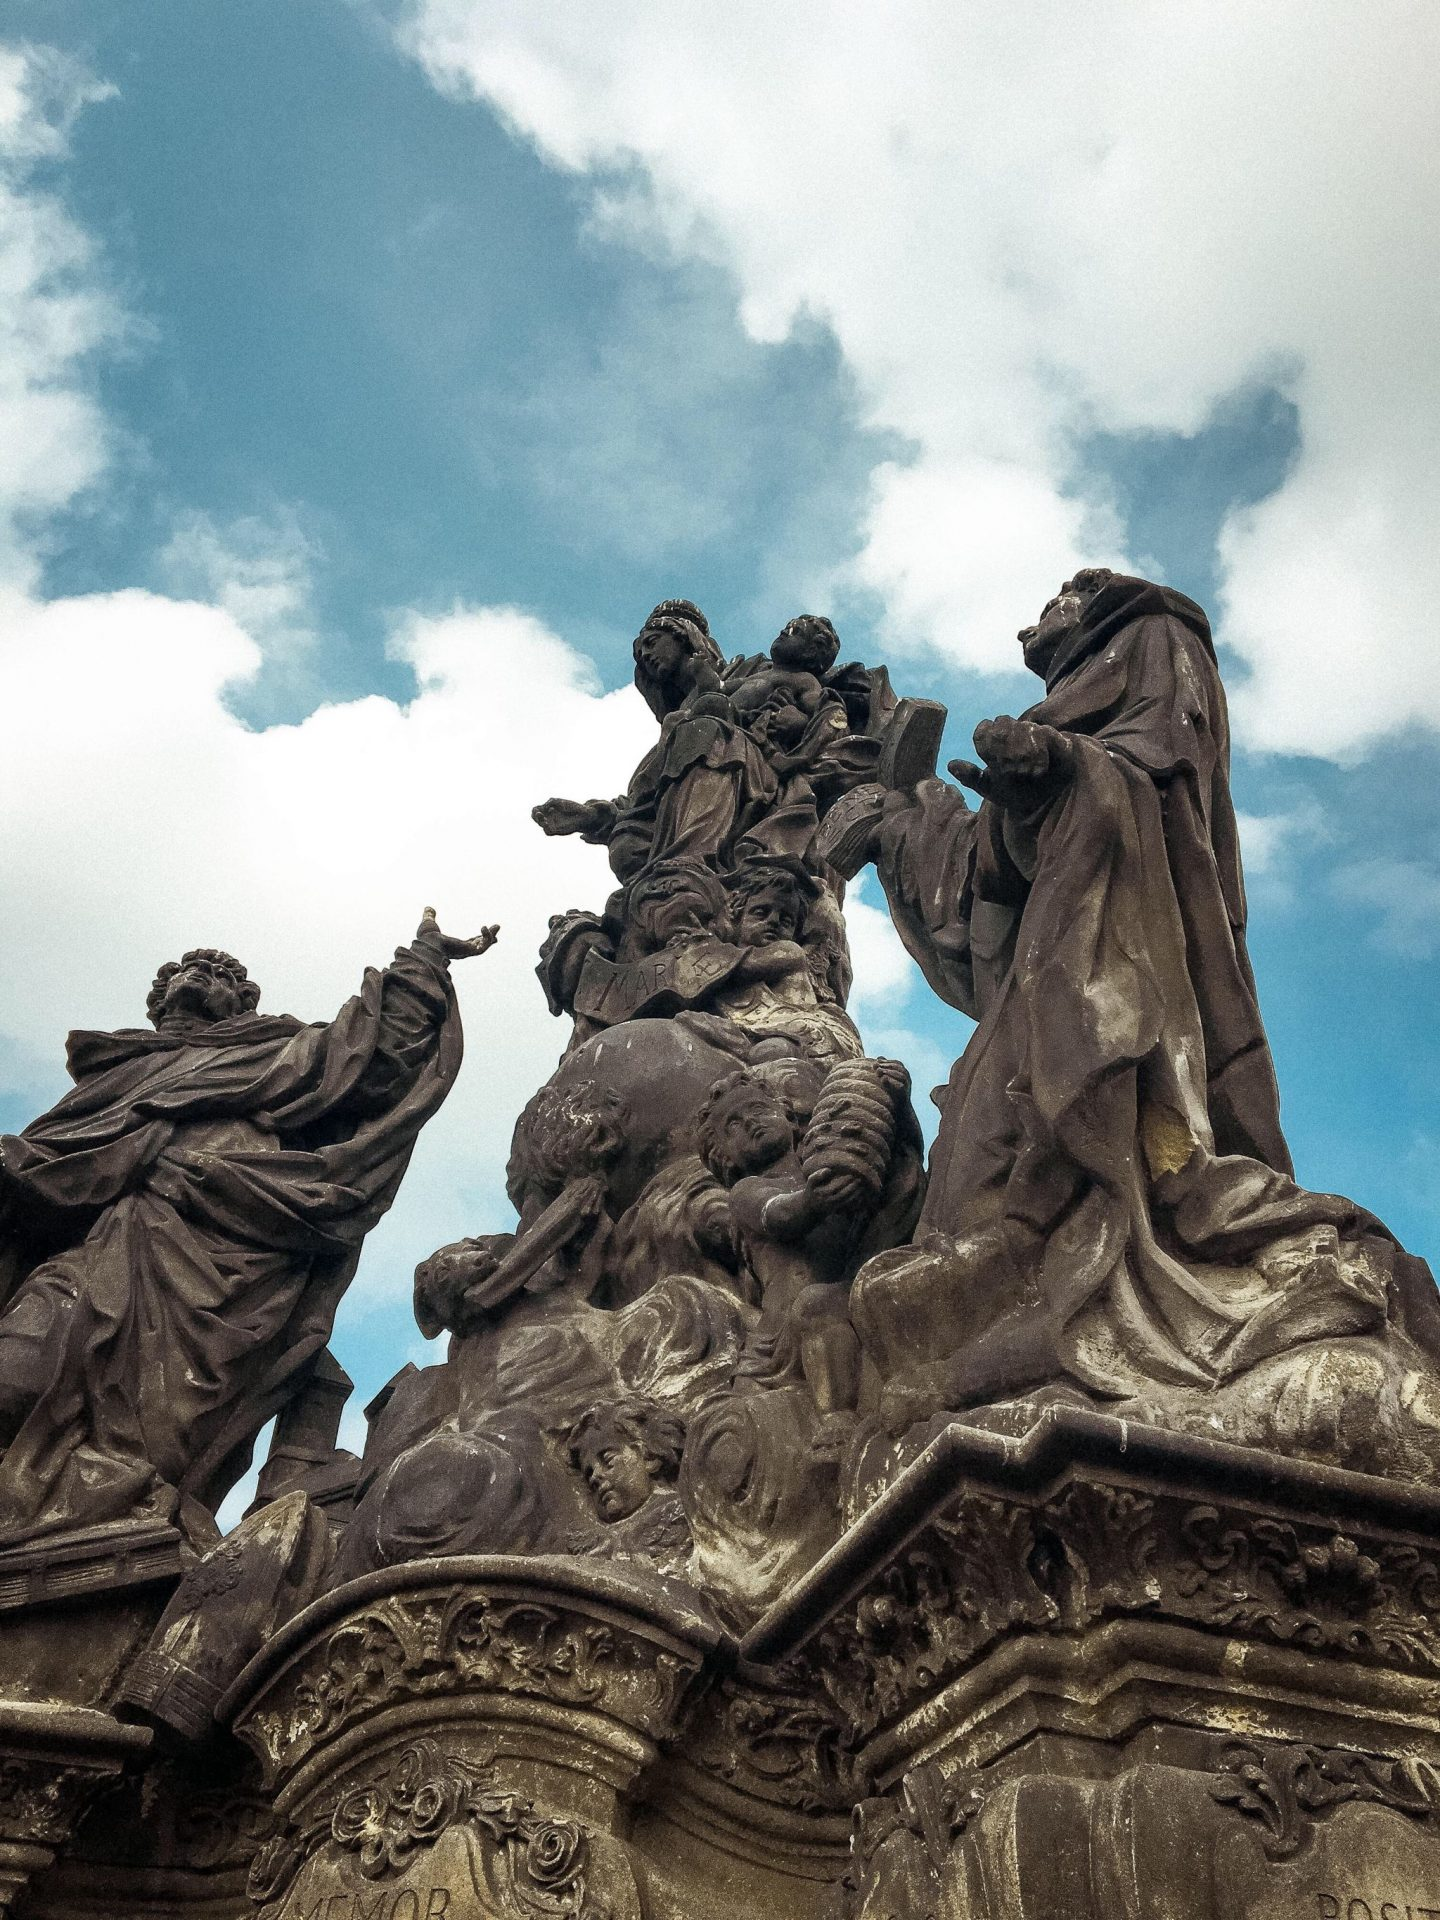 Day in Prague as a proper tourist